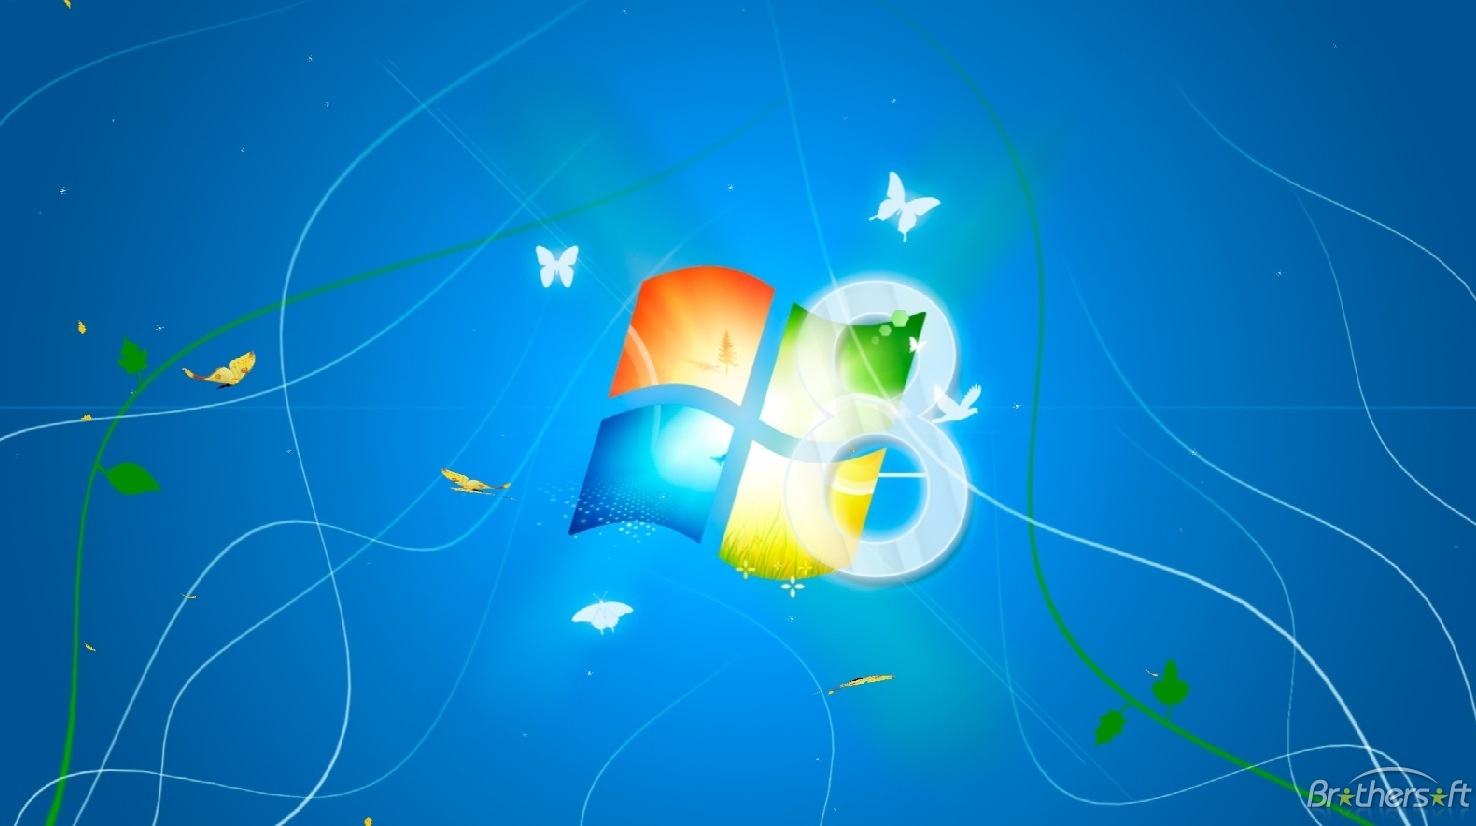 Download Windows 8 Light Animated Wallpaper Windows 8 Light 1476x826